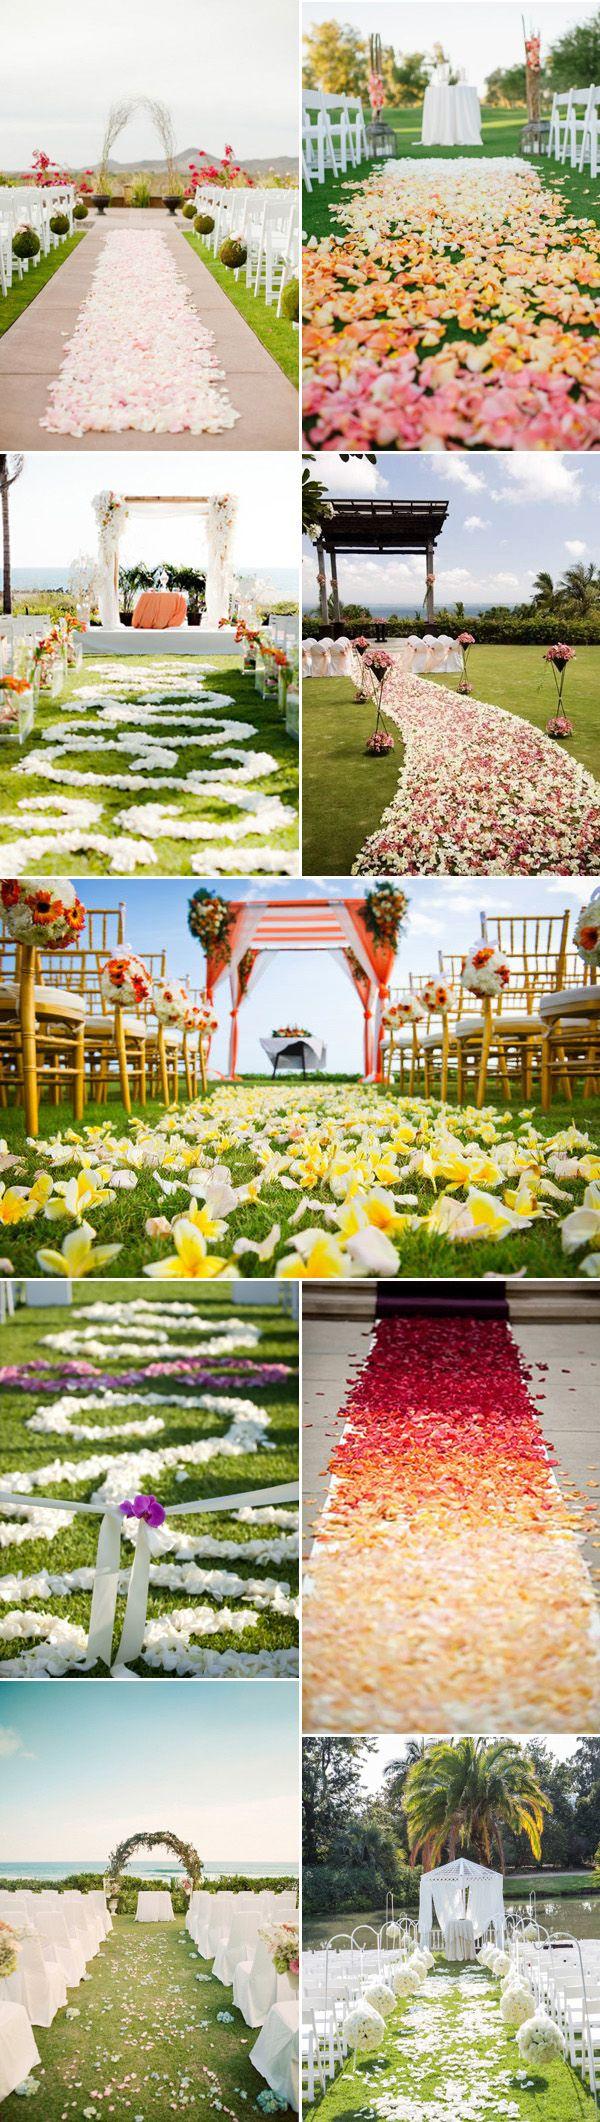 aisle runners wedding runners petals wedding aisle runners for romantic outdoor wedding ideas